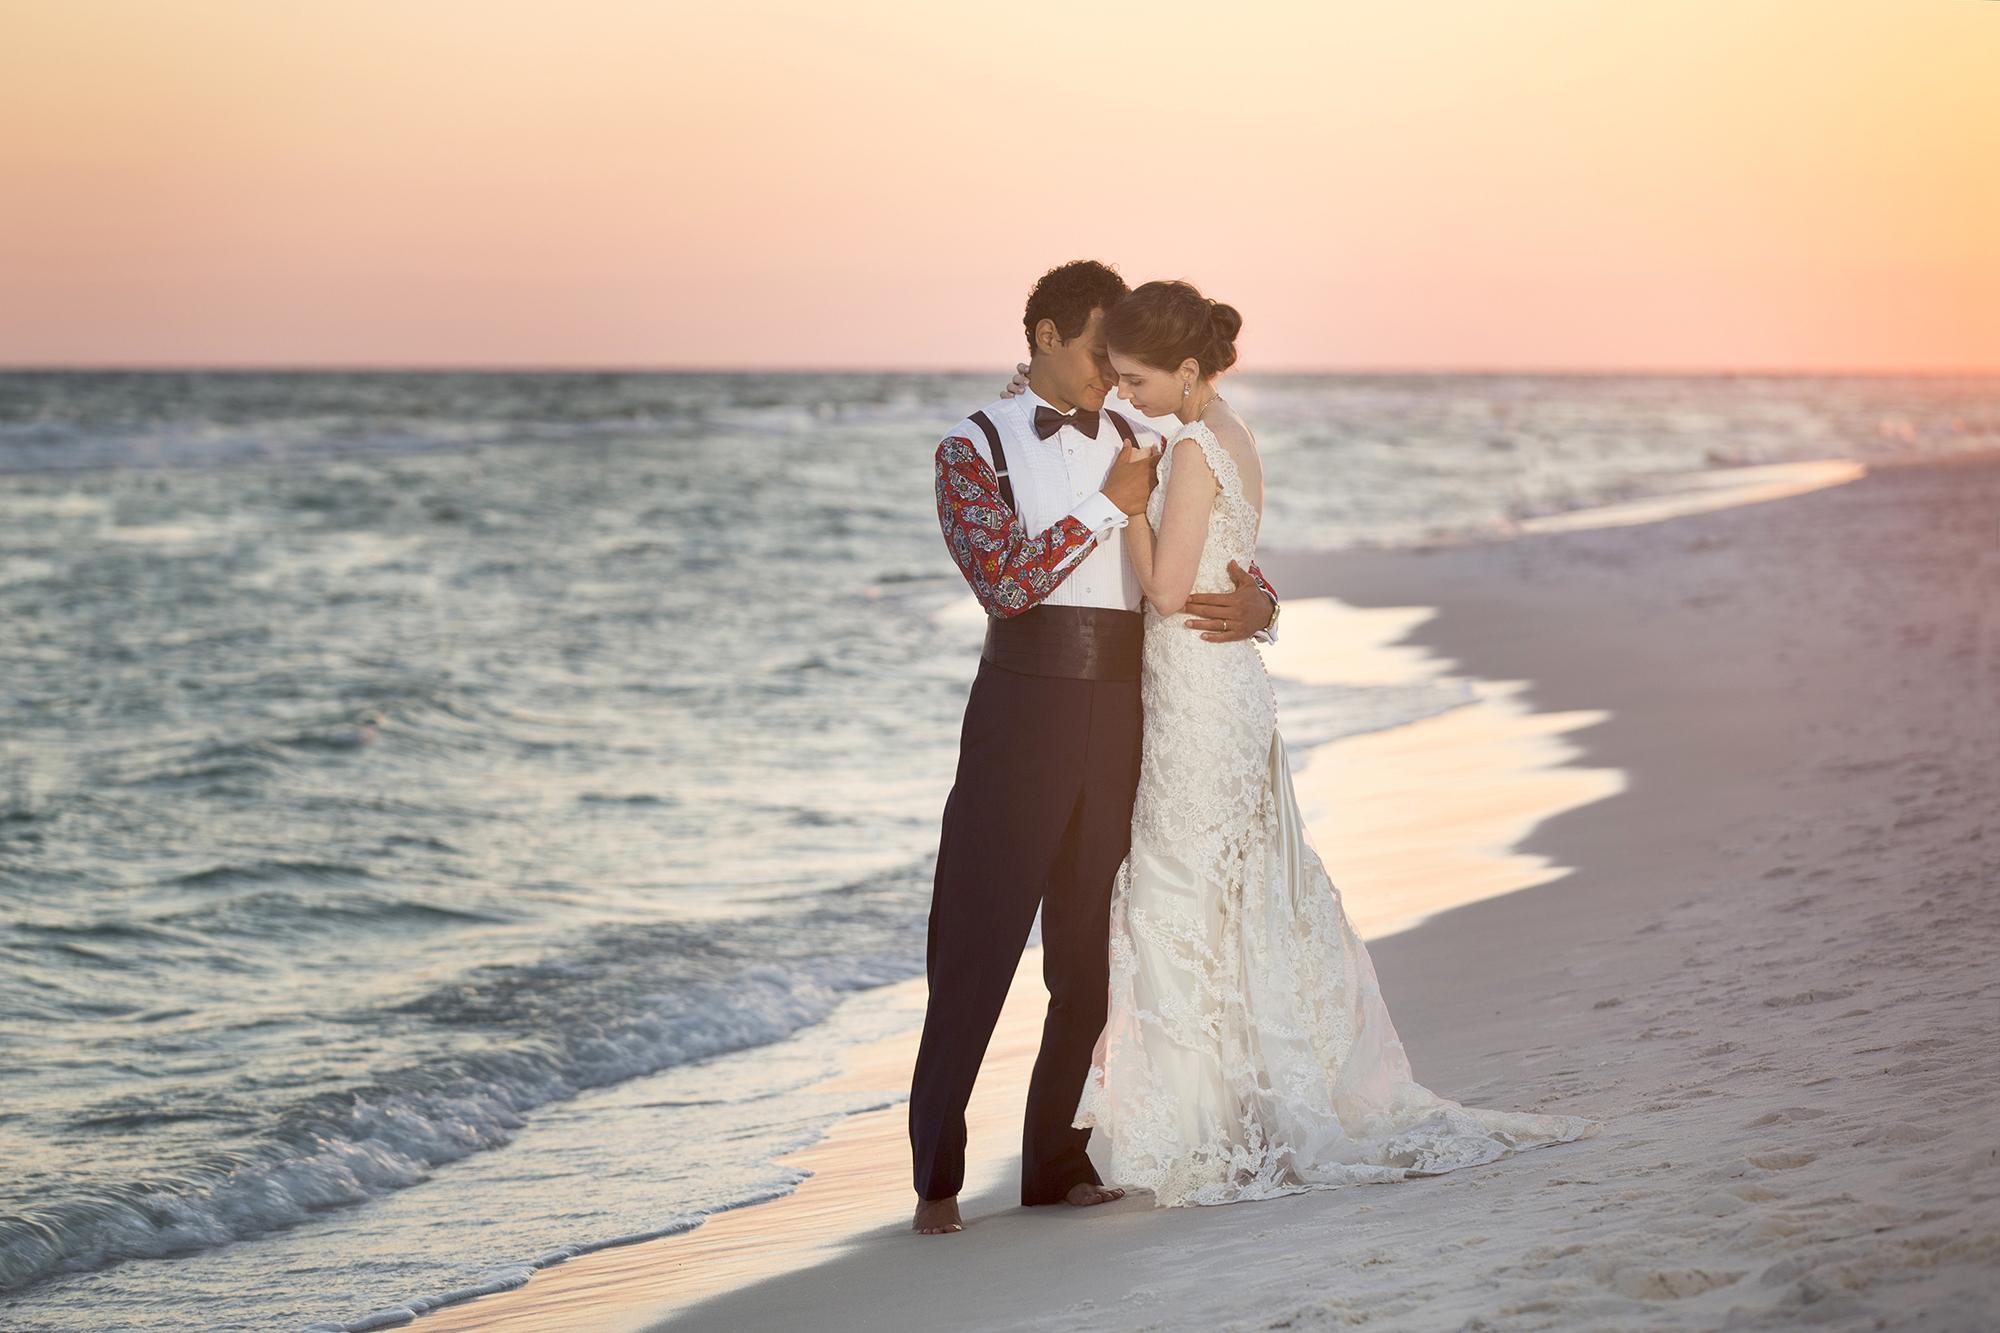 Environmental Portrait, Couple, Delray Beach,Fl., Boca Raton, Lakeworth,Pompano Beach, Boynton Beach,West Palm Beach, Portrait